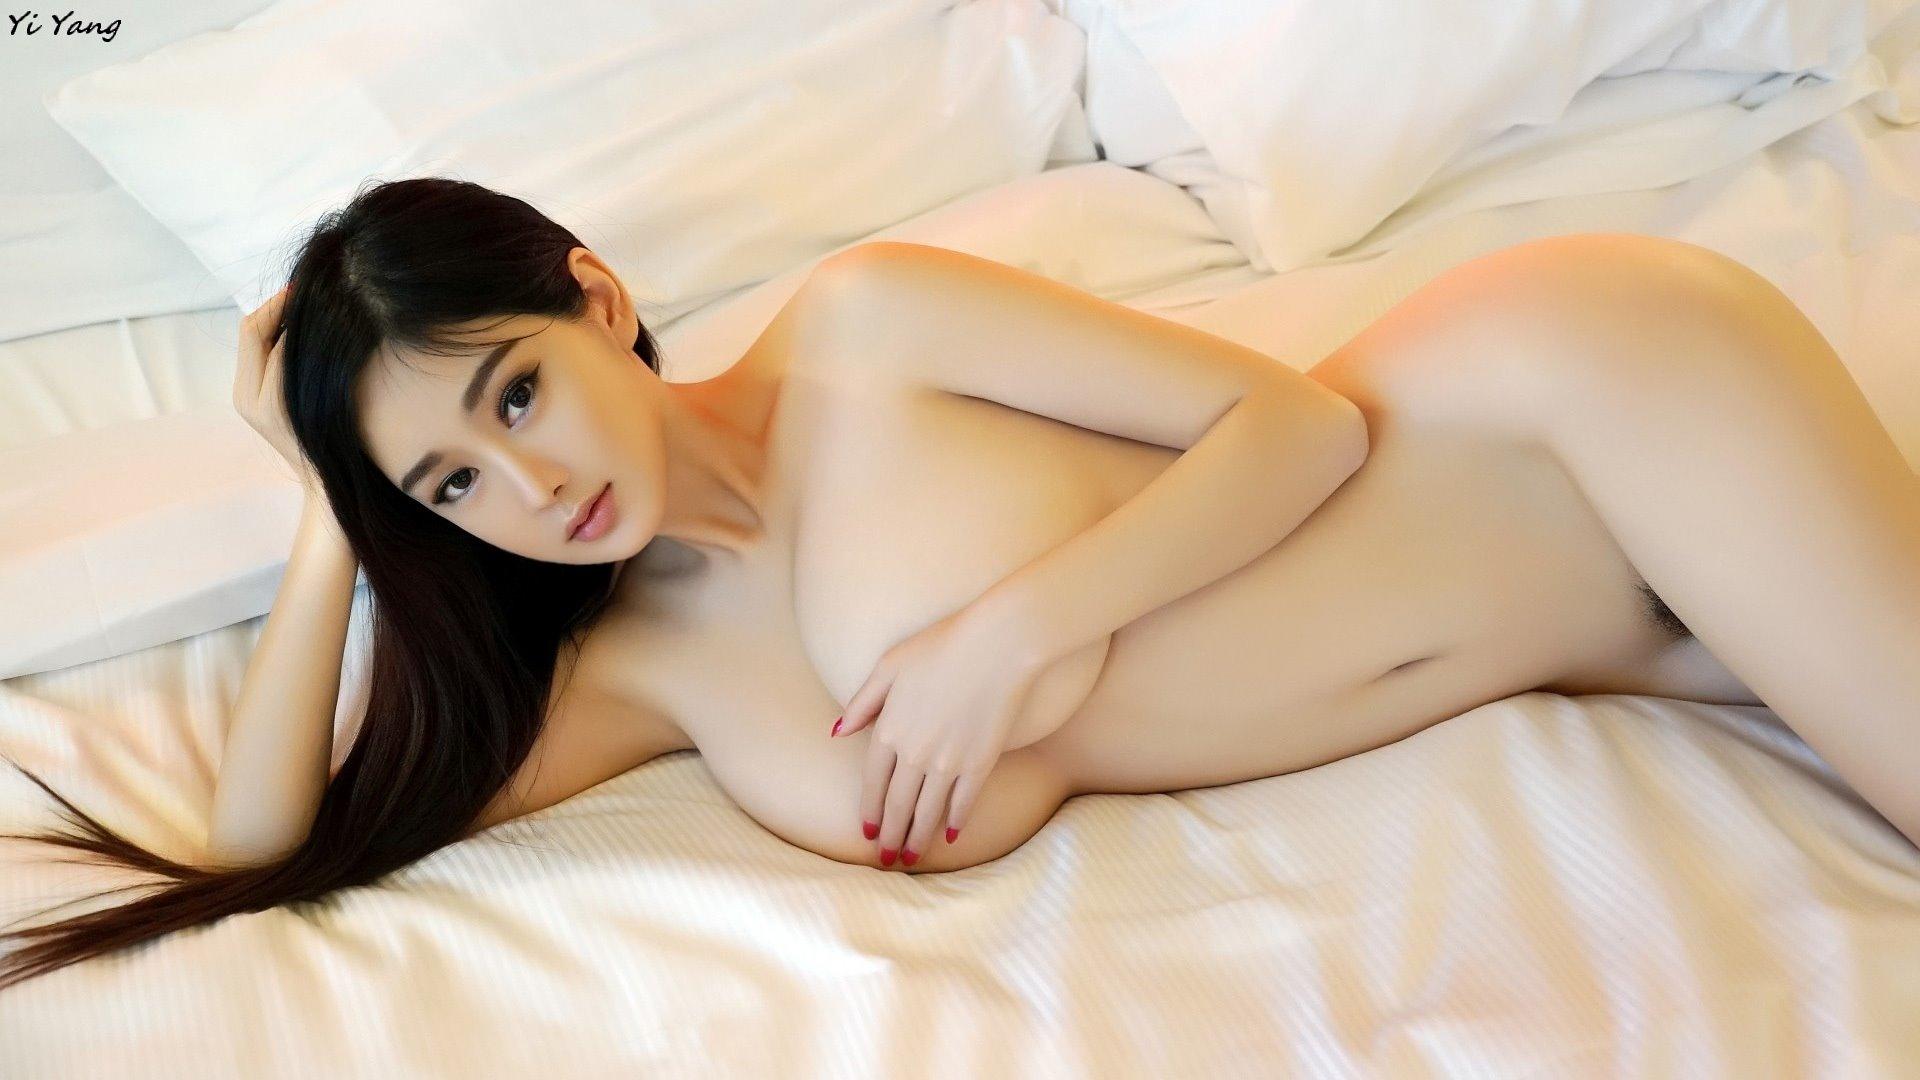 易阳易阳nude XIUREN秀人] No.1583 易阳Silvia 写真套图 - 5/39 - 3次エロ ...